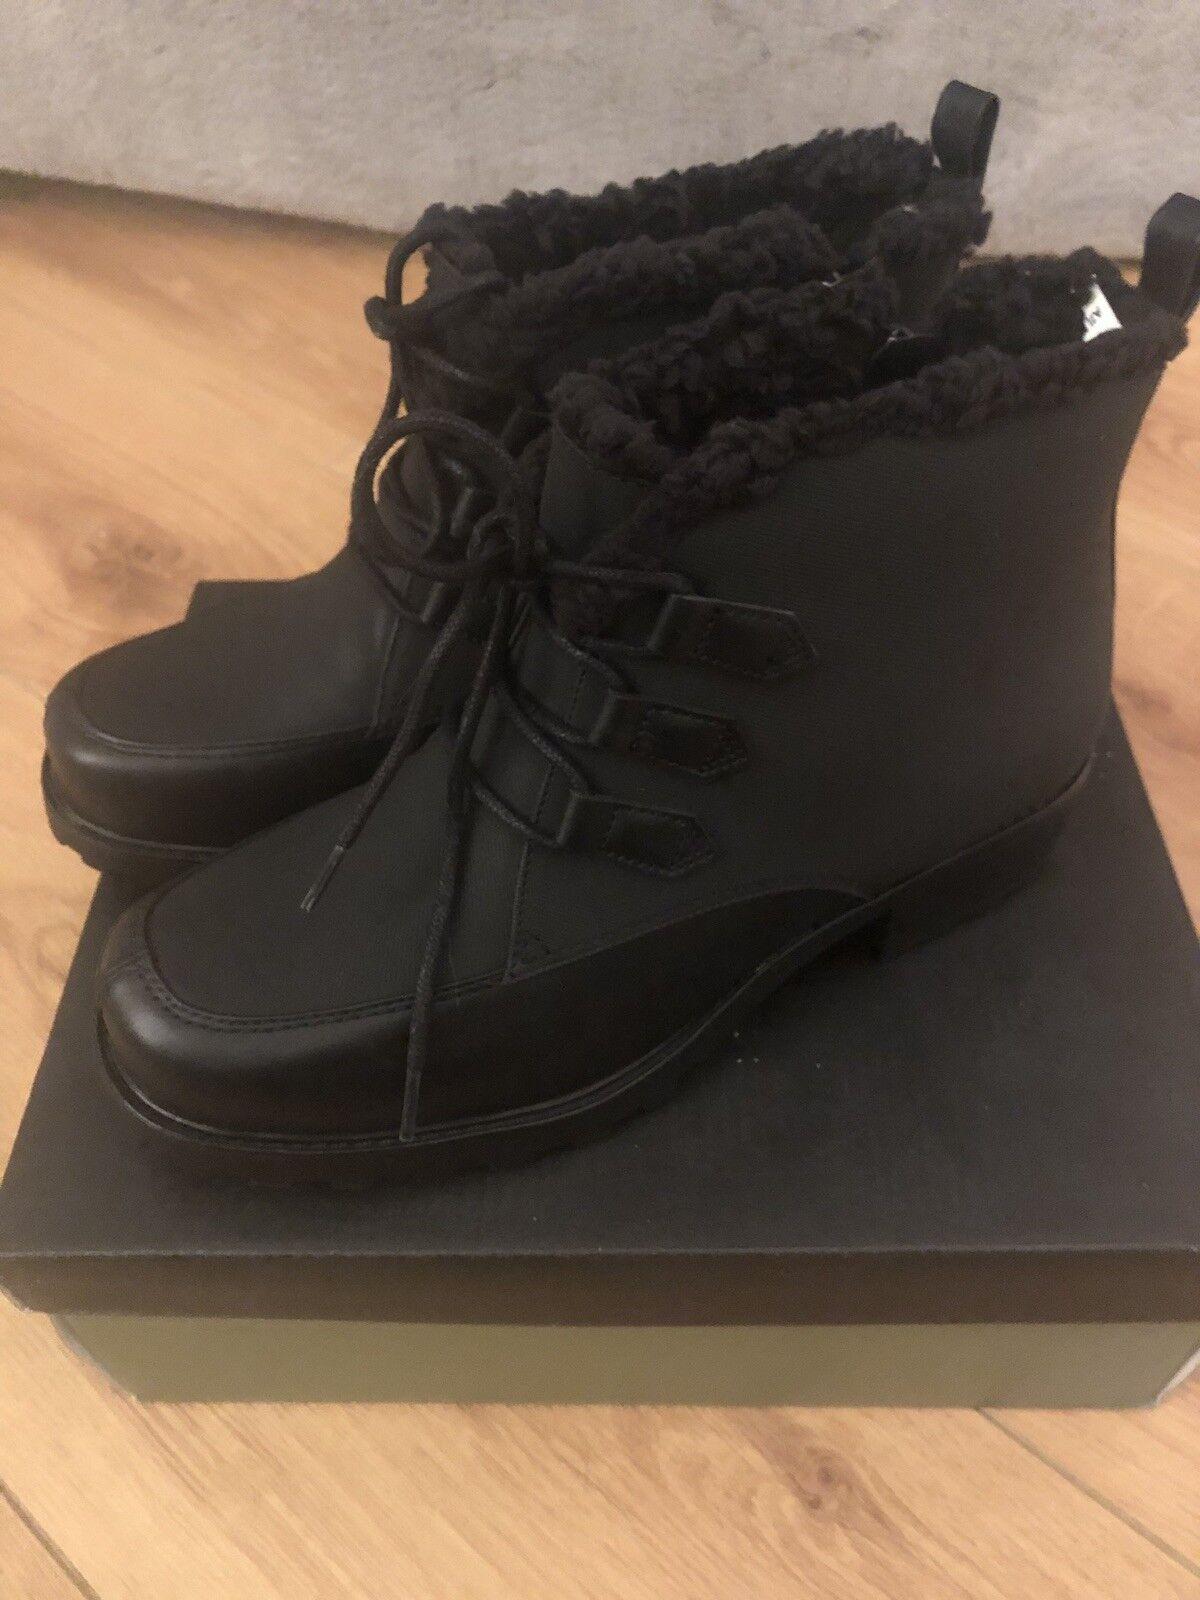 BRAND NEW TredTERS SNOWFLAKES III ladies fleece lined ankle boot-black UK 7.5 M